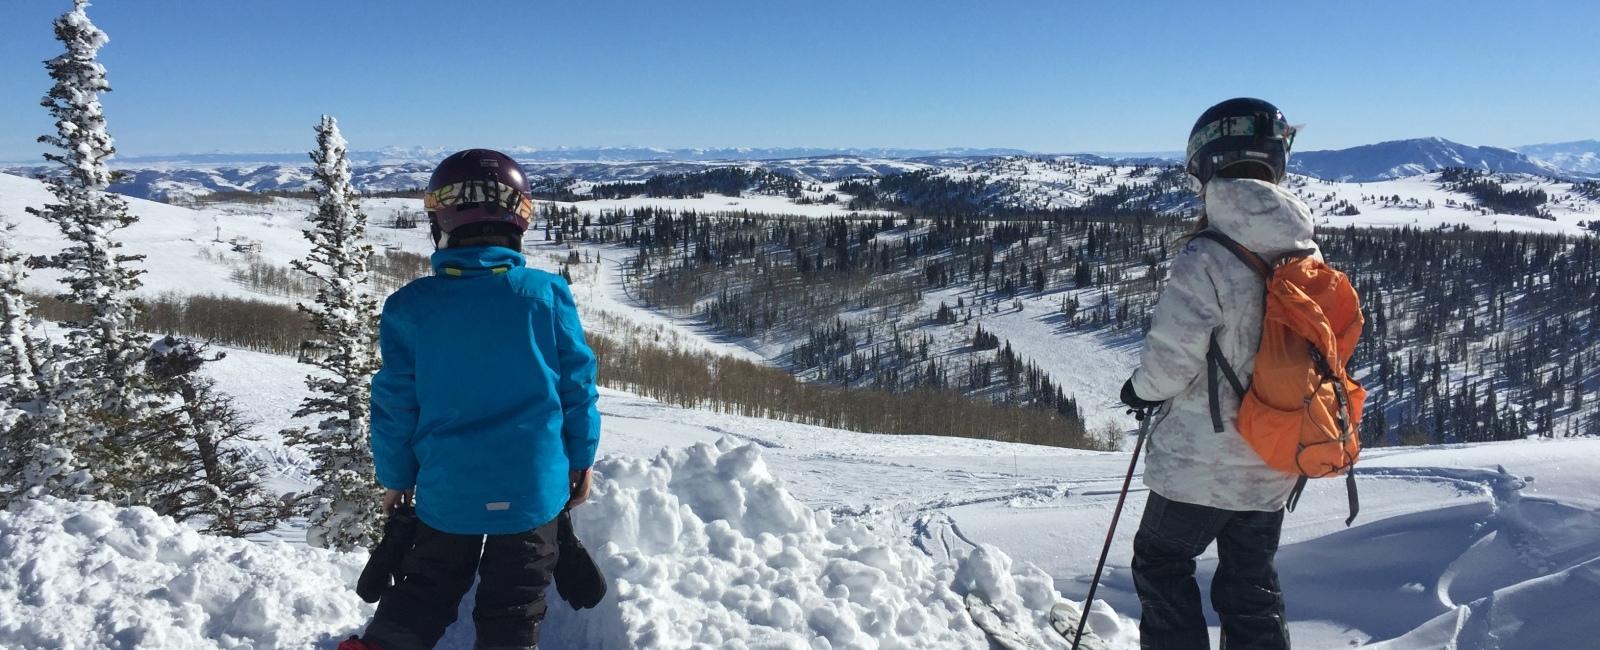 Reasons why Powder Mountain is the best kept secret in Utah